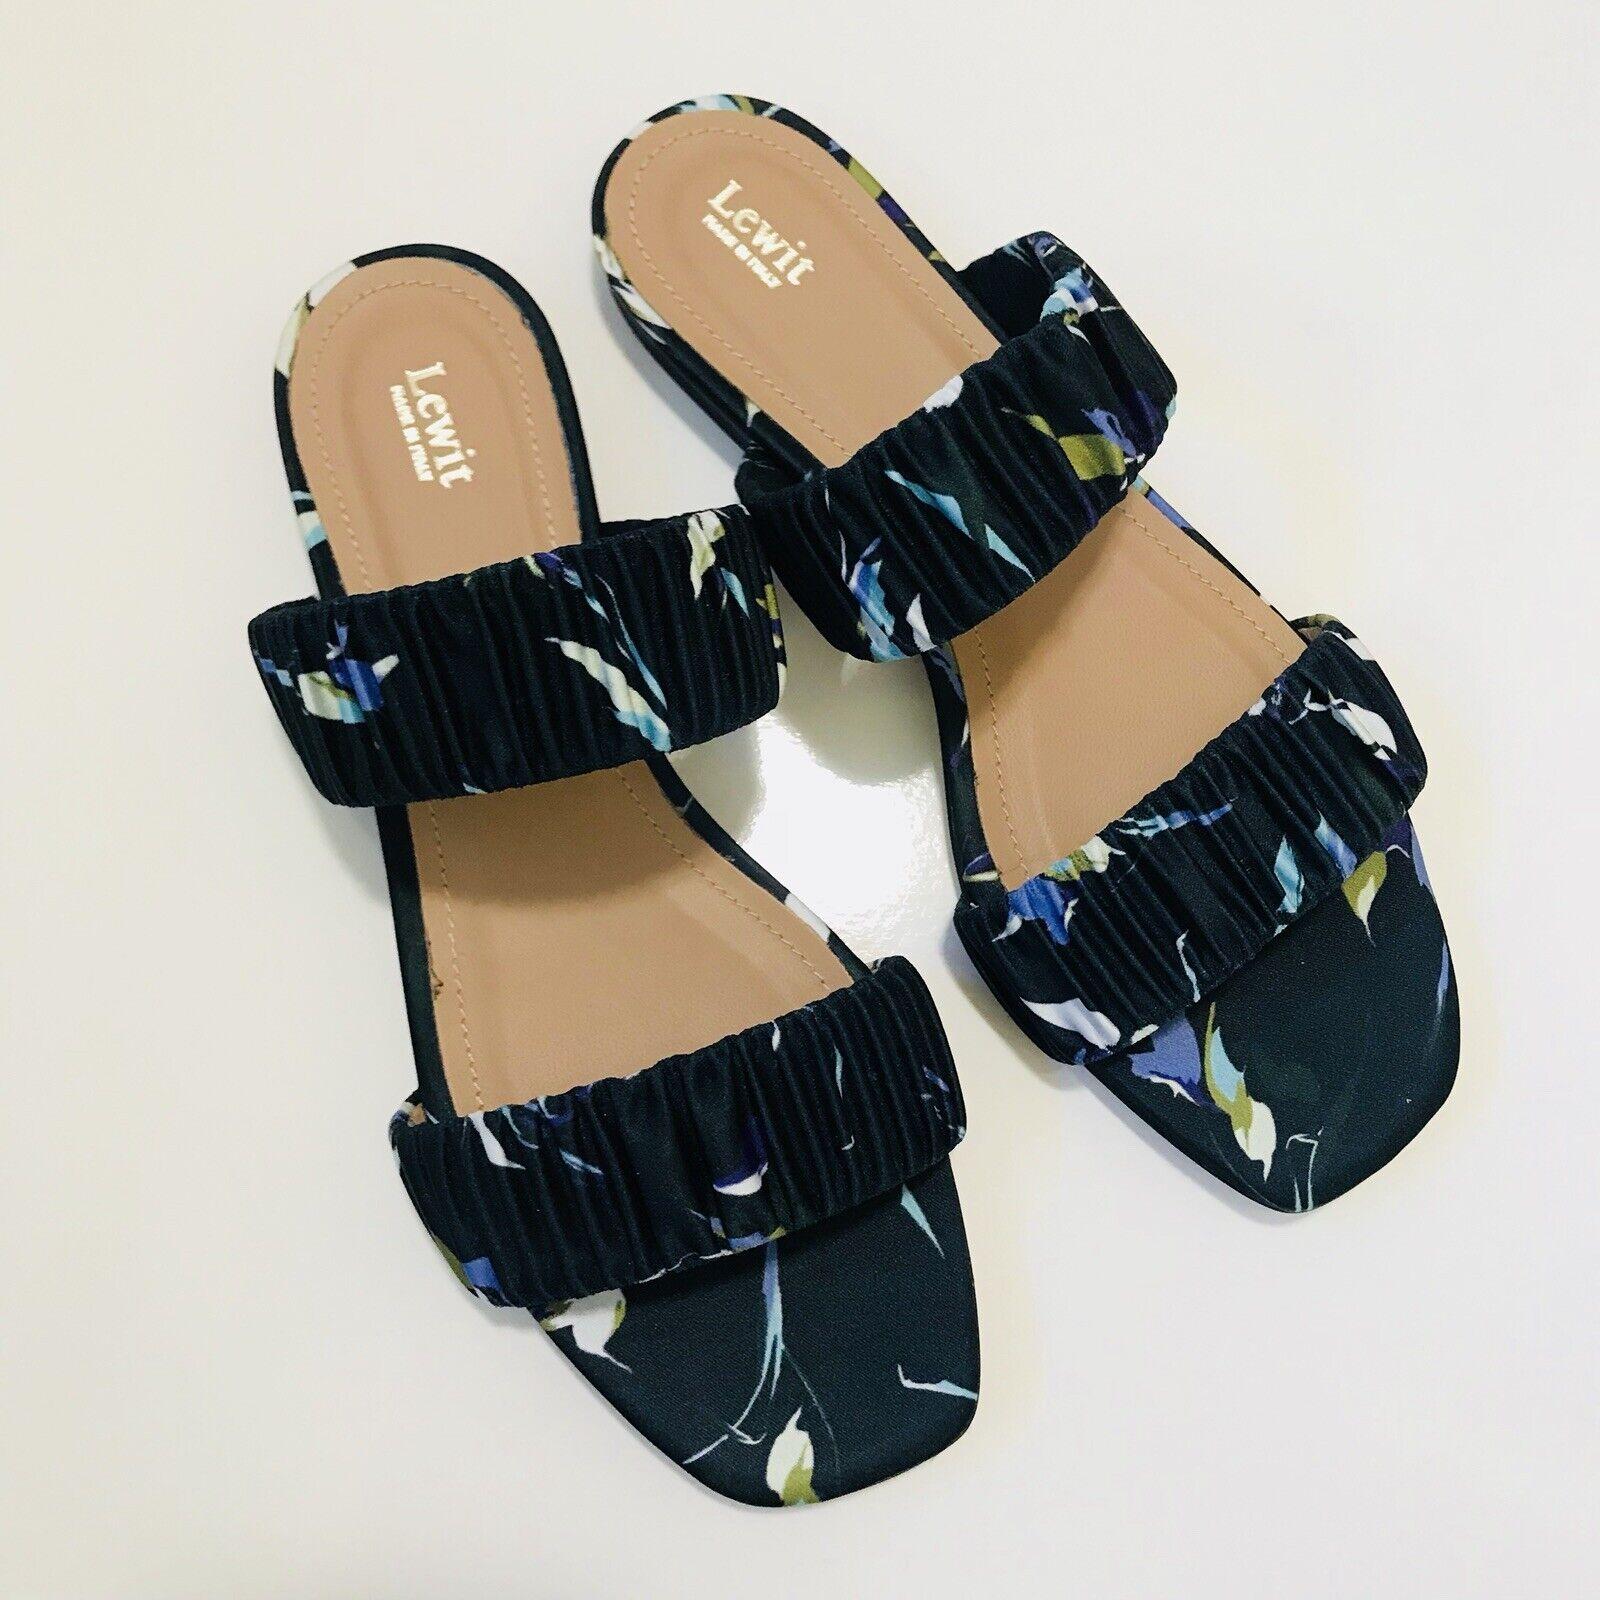 LEWIT Elena Ruched Slide Sandals in blu bianca  Dimensione 36   6 New MSRP  175